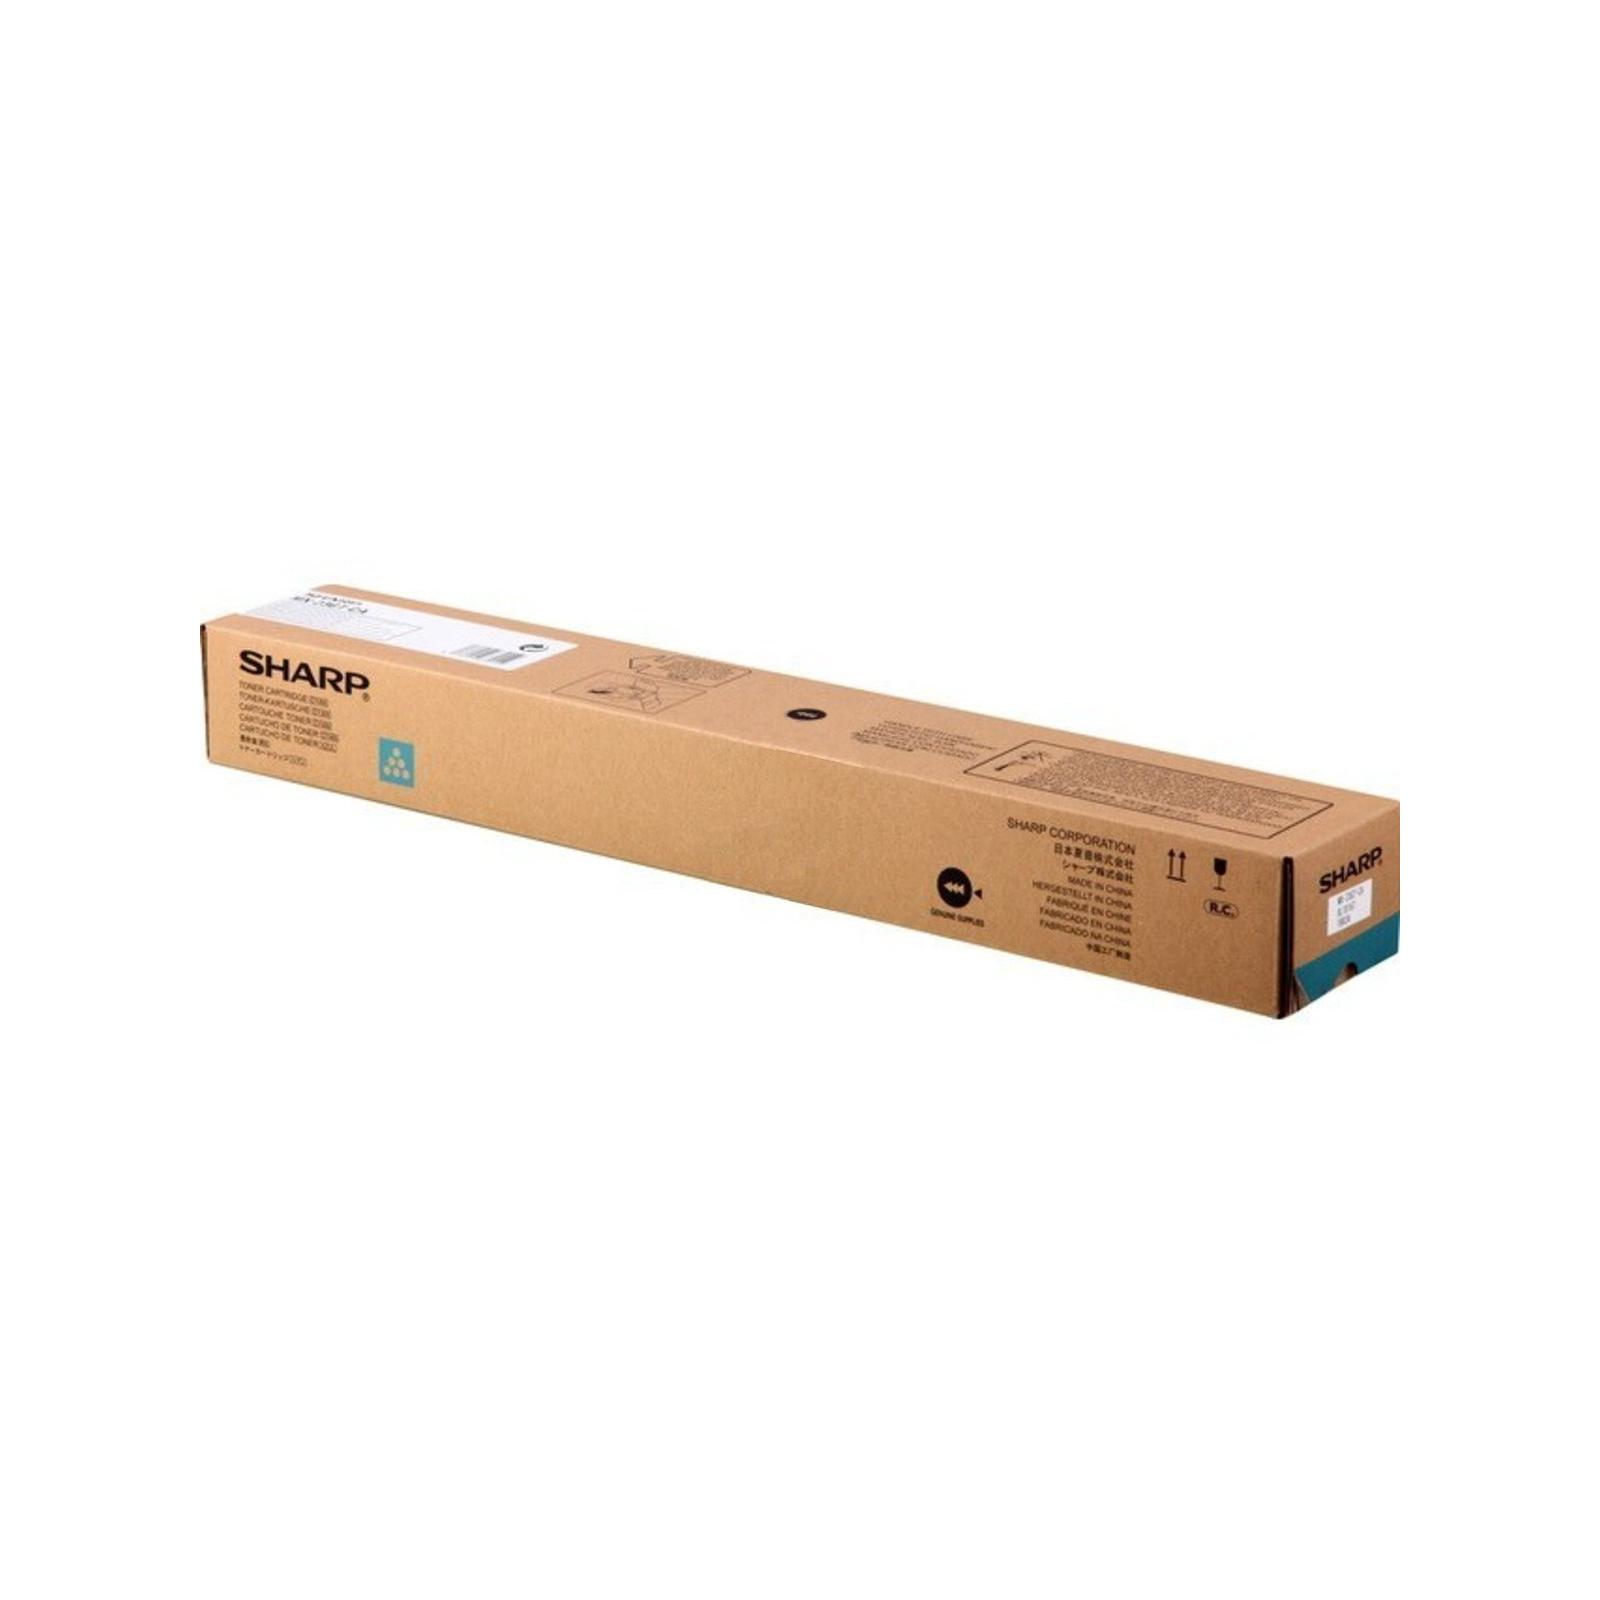 Тонер-картридж SHARP MX 23GTCA Cyan 10K (MX23GTCA/MX-23GTCA)